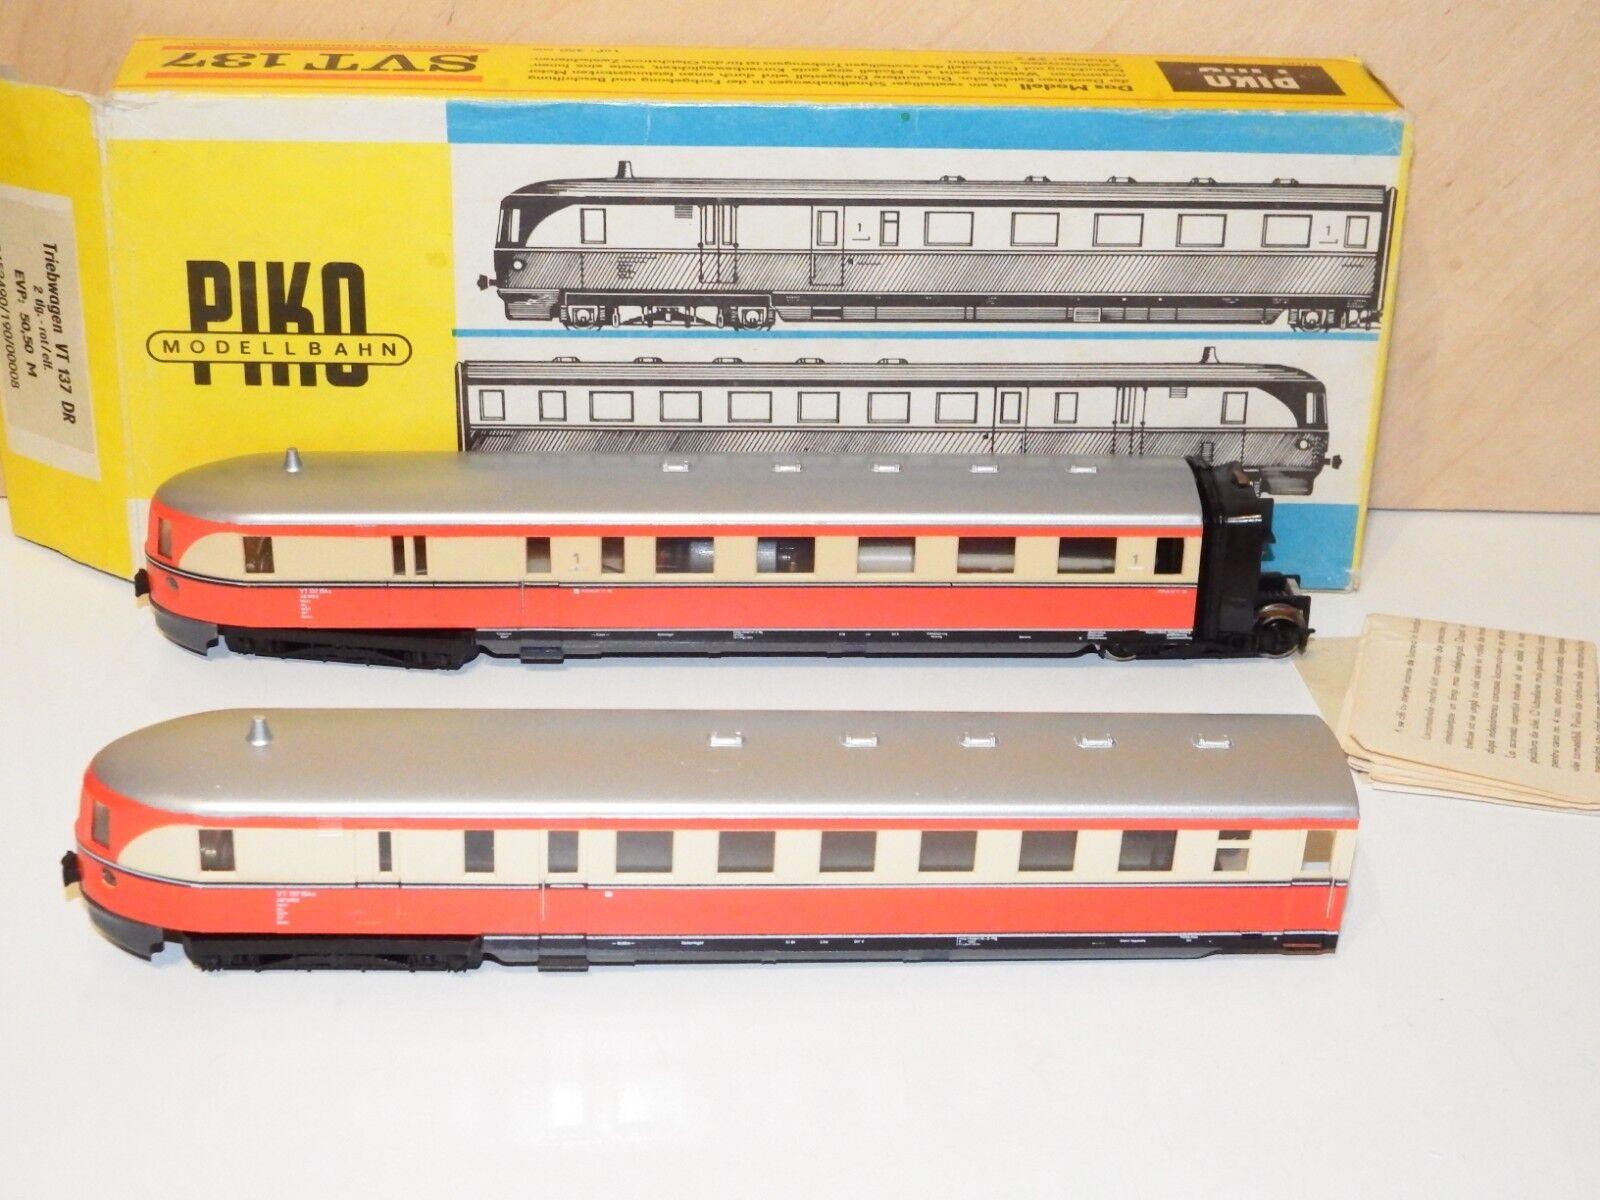 H0 Piko Svt 137 Fast Railcar Dr VT 137 154 Mip 8623